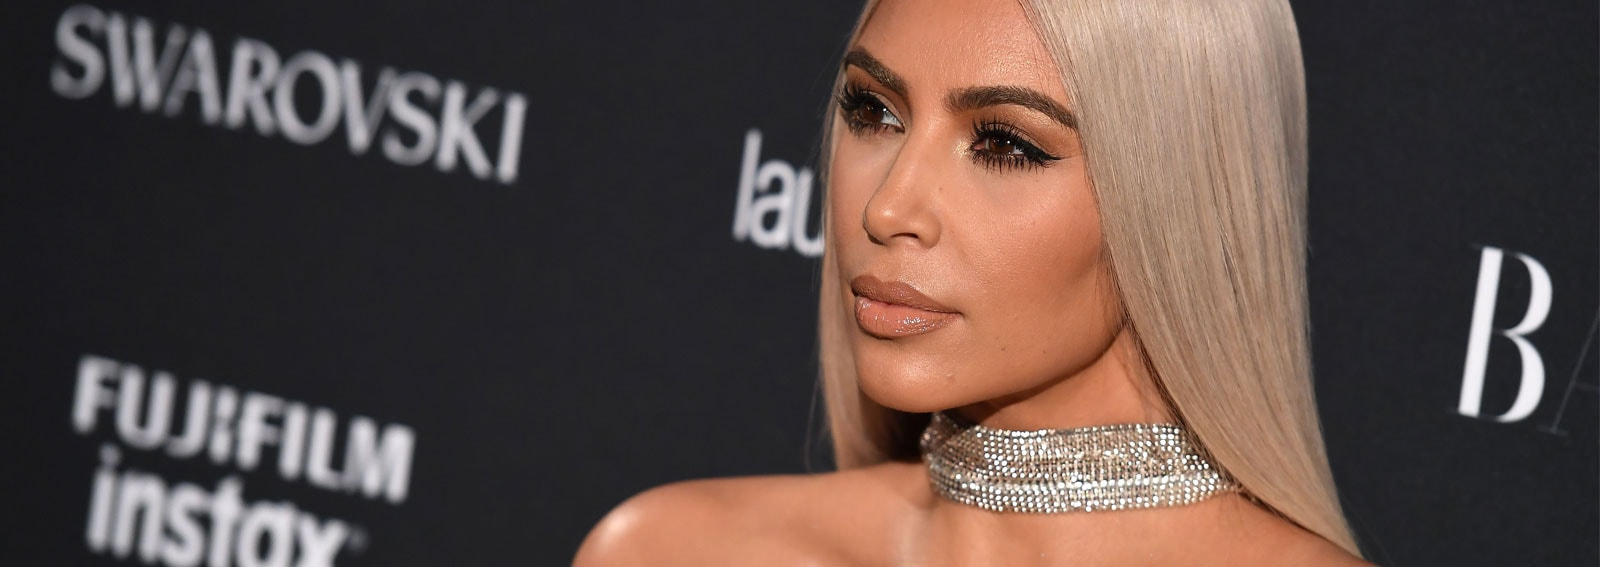 mascara-preferito-kim-kardashian-l-oreal-cover-desktop